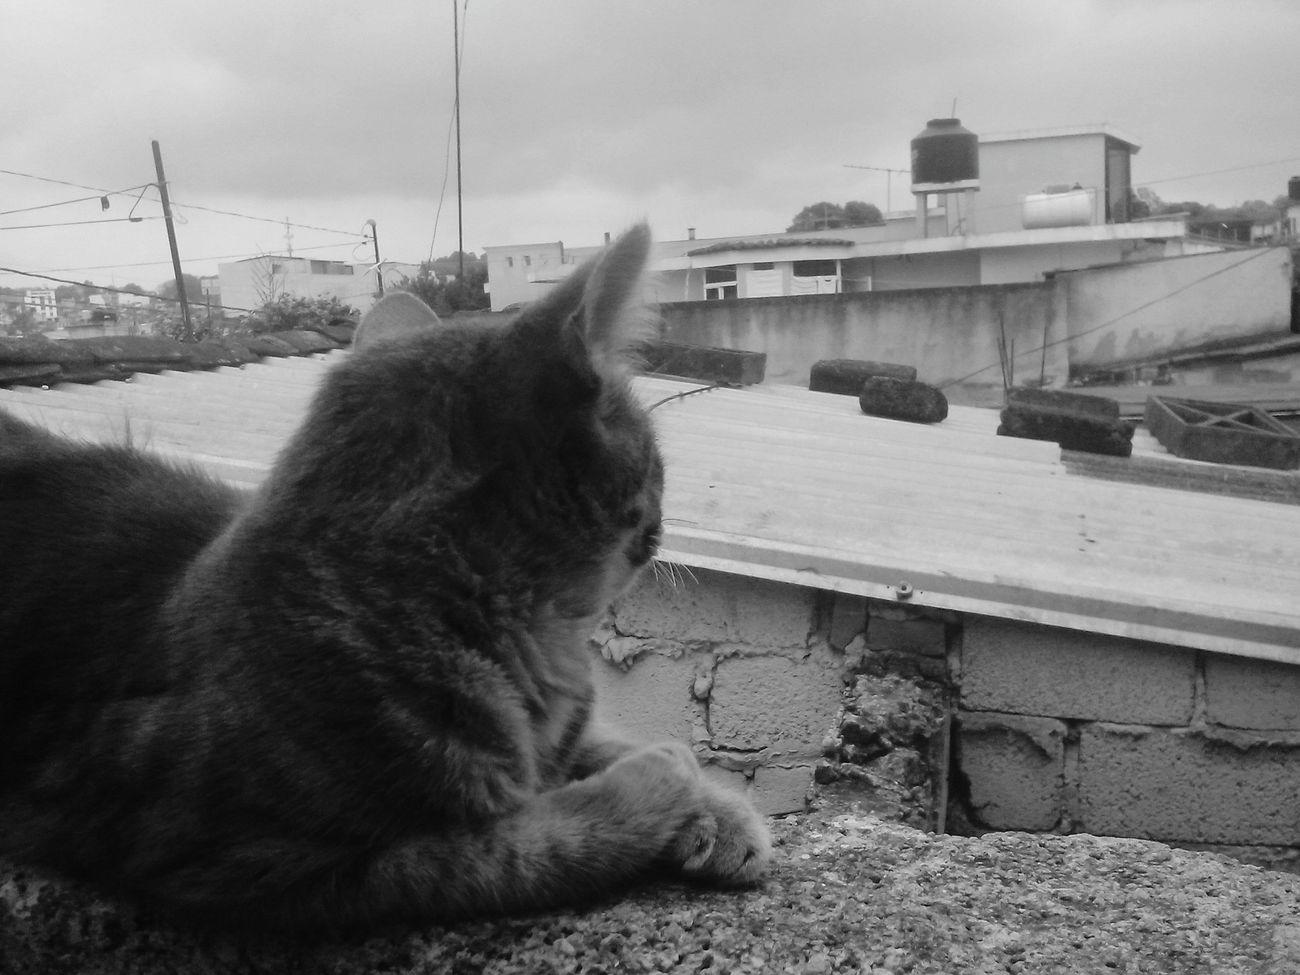 Photooftheday EyeEm Best Edits First Eyeem Photo Taking Photos TheDay Cat